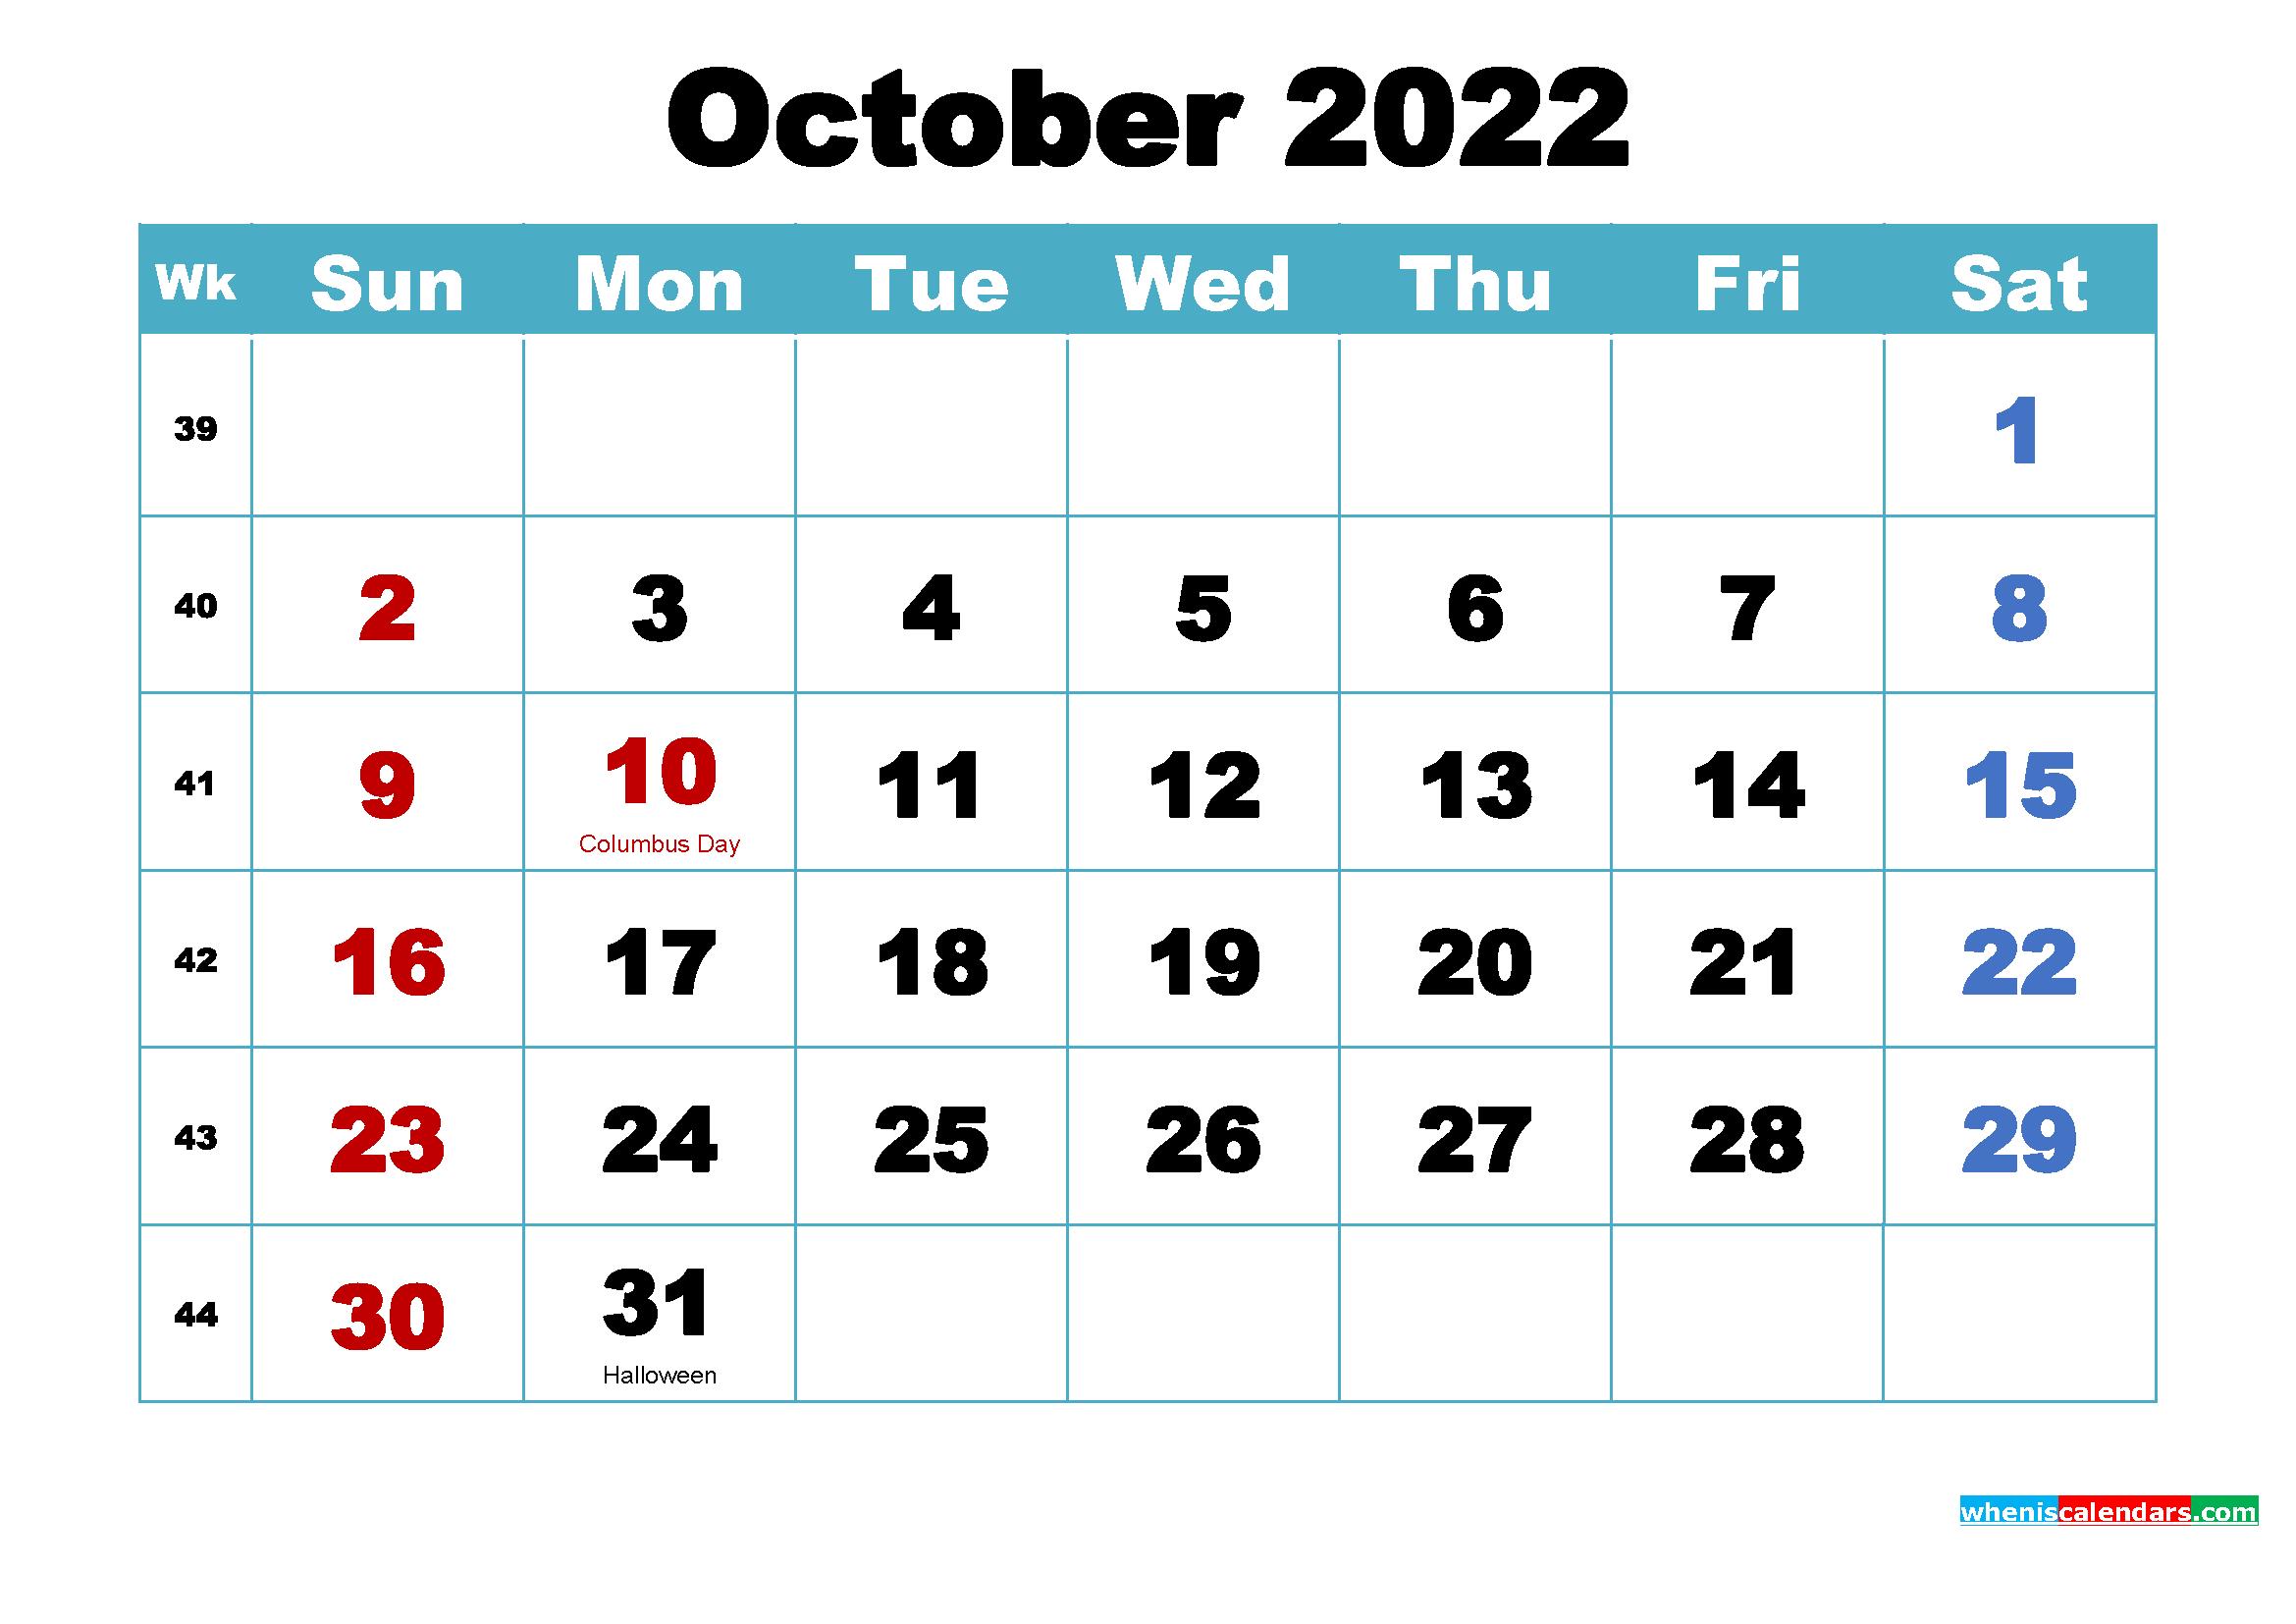 October 2022 Calendar Wallpaper Free Download